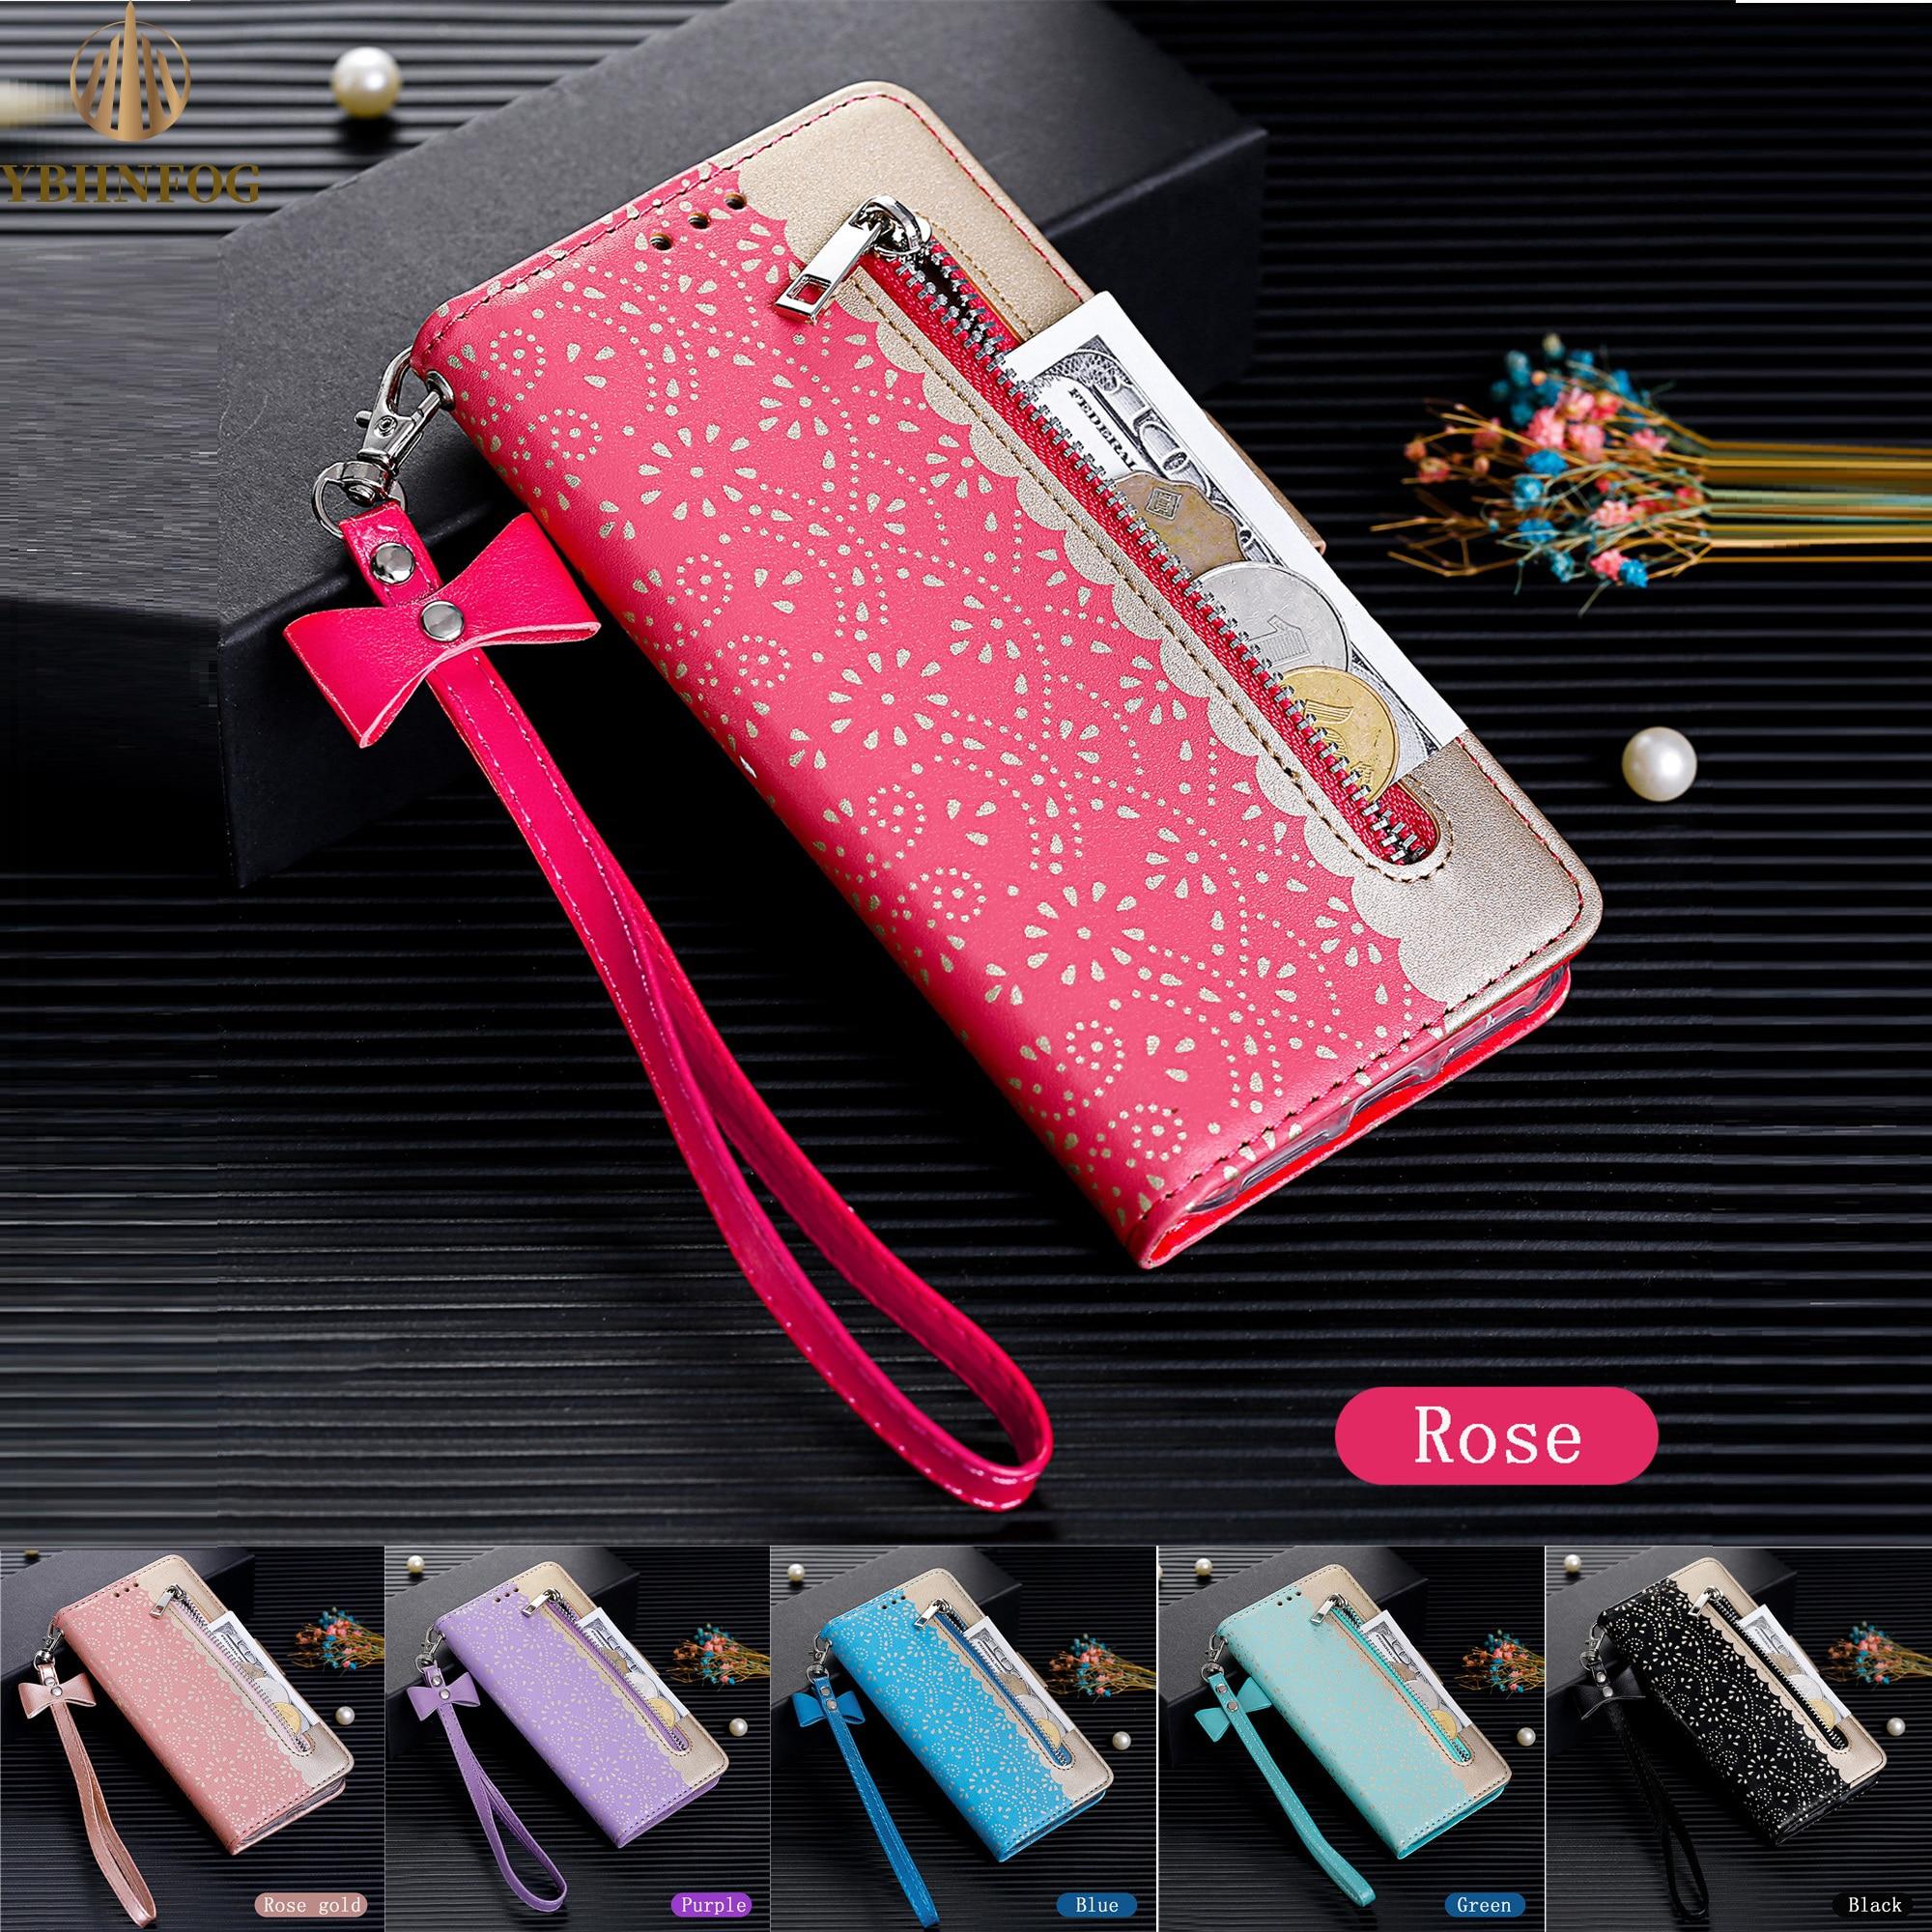 Fashion Zipper Flip Case For Samsung Galaxy A10 A20 A30 A40 A50 A41 A51 S6 S7 Edge S8 S9 Plus S10 S20 Ultra Leather Wallet Cover